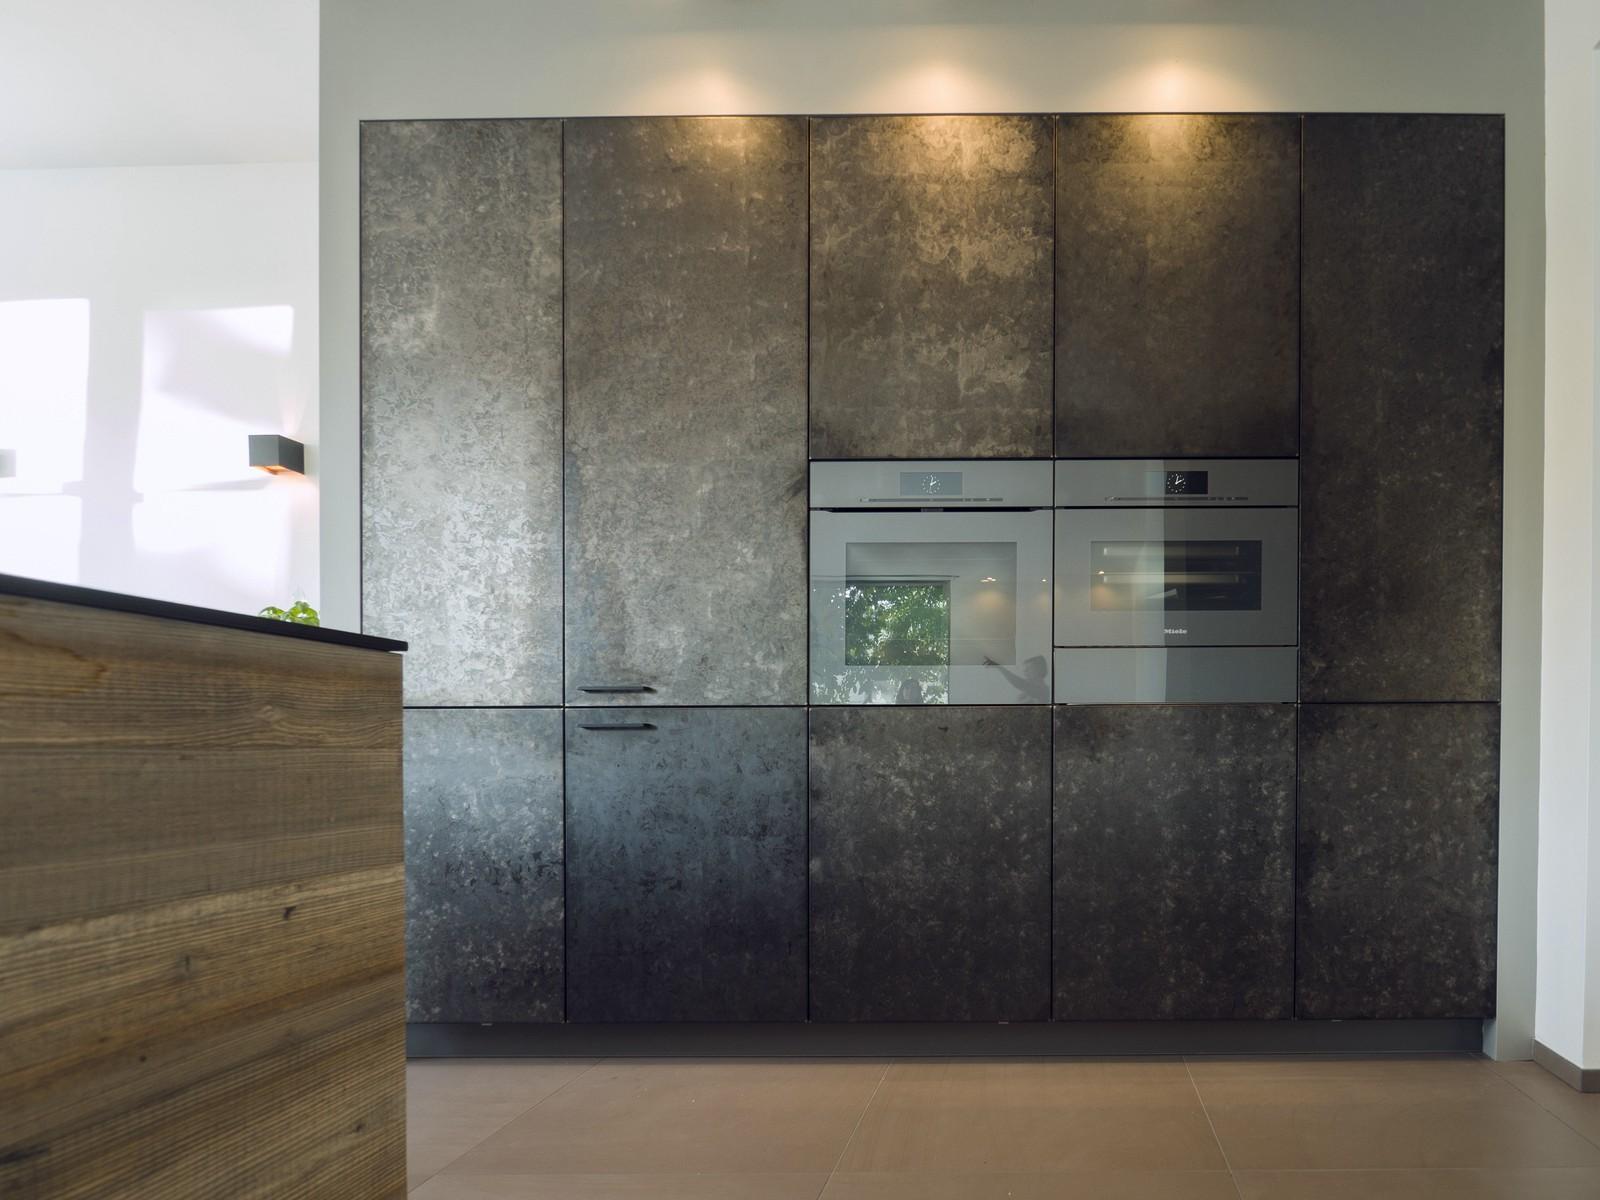 Kueche Exklusiv Design Fronten Holz Furnier Sonnenverbrannt Stahl Keramik Arbeitsplatte Miele 50